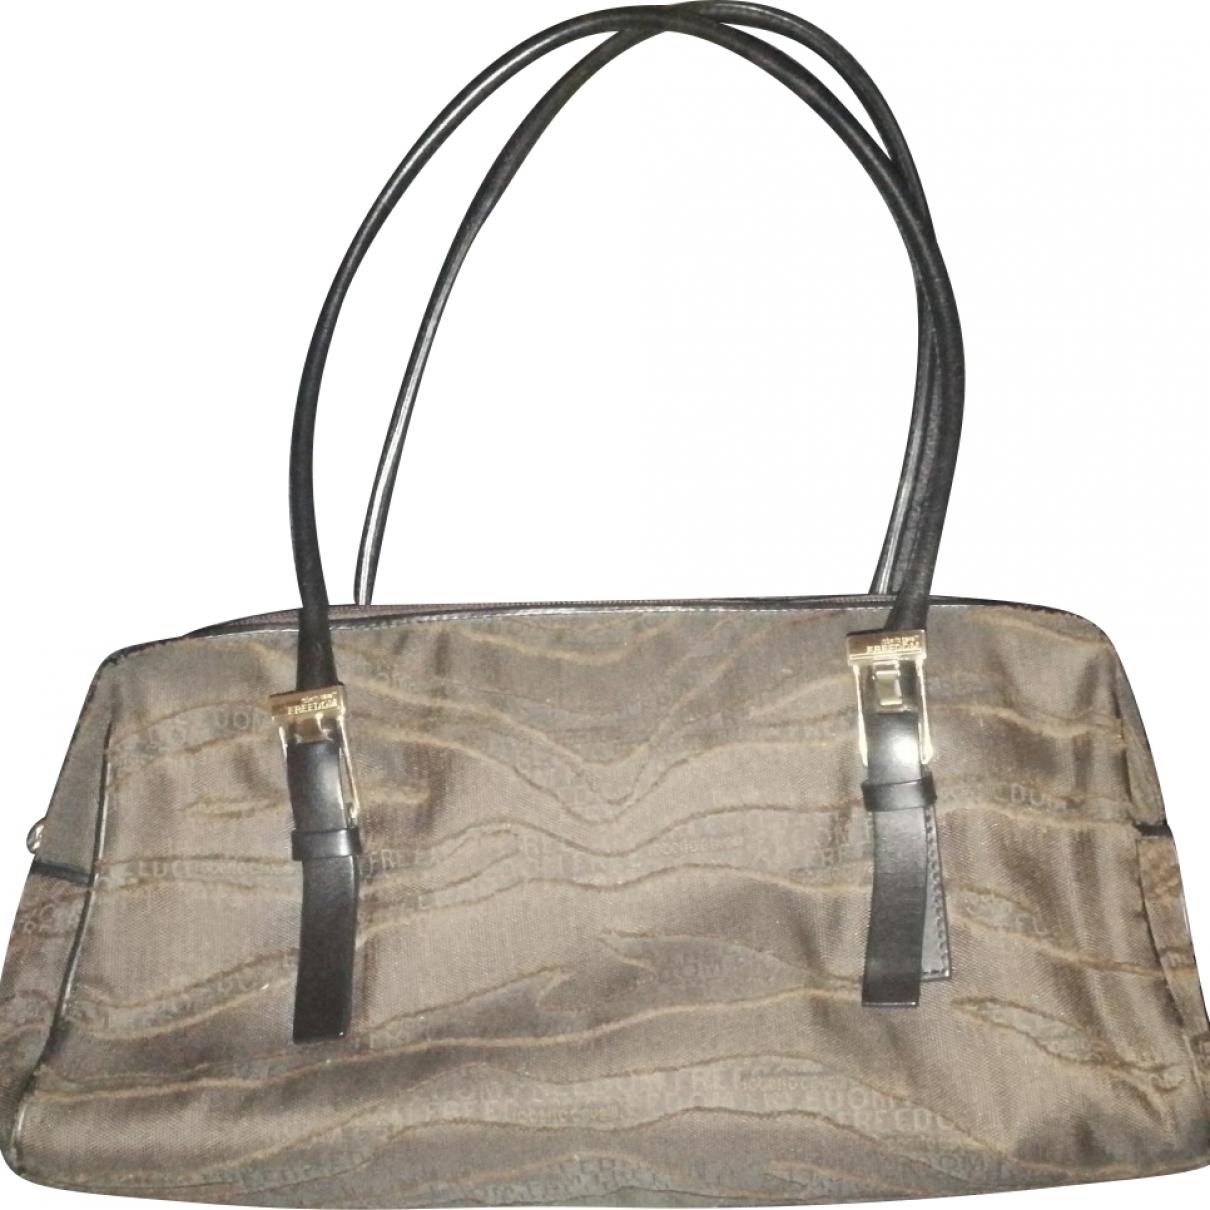 Roberto Cavalli \N Brown Cloth handbag for Women \N